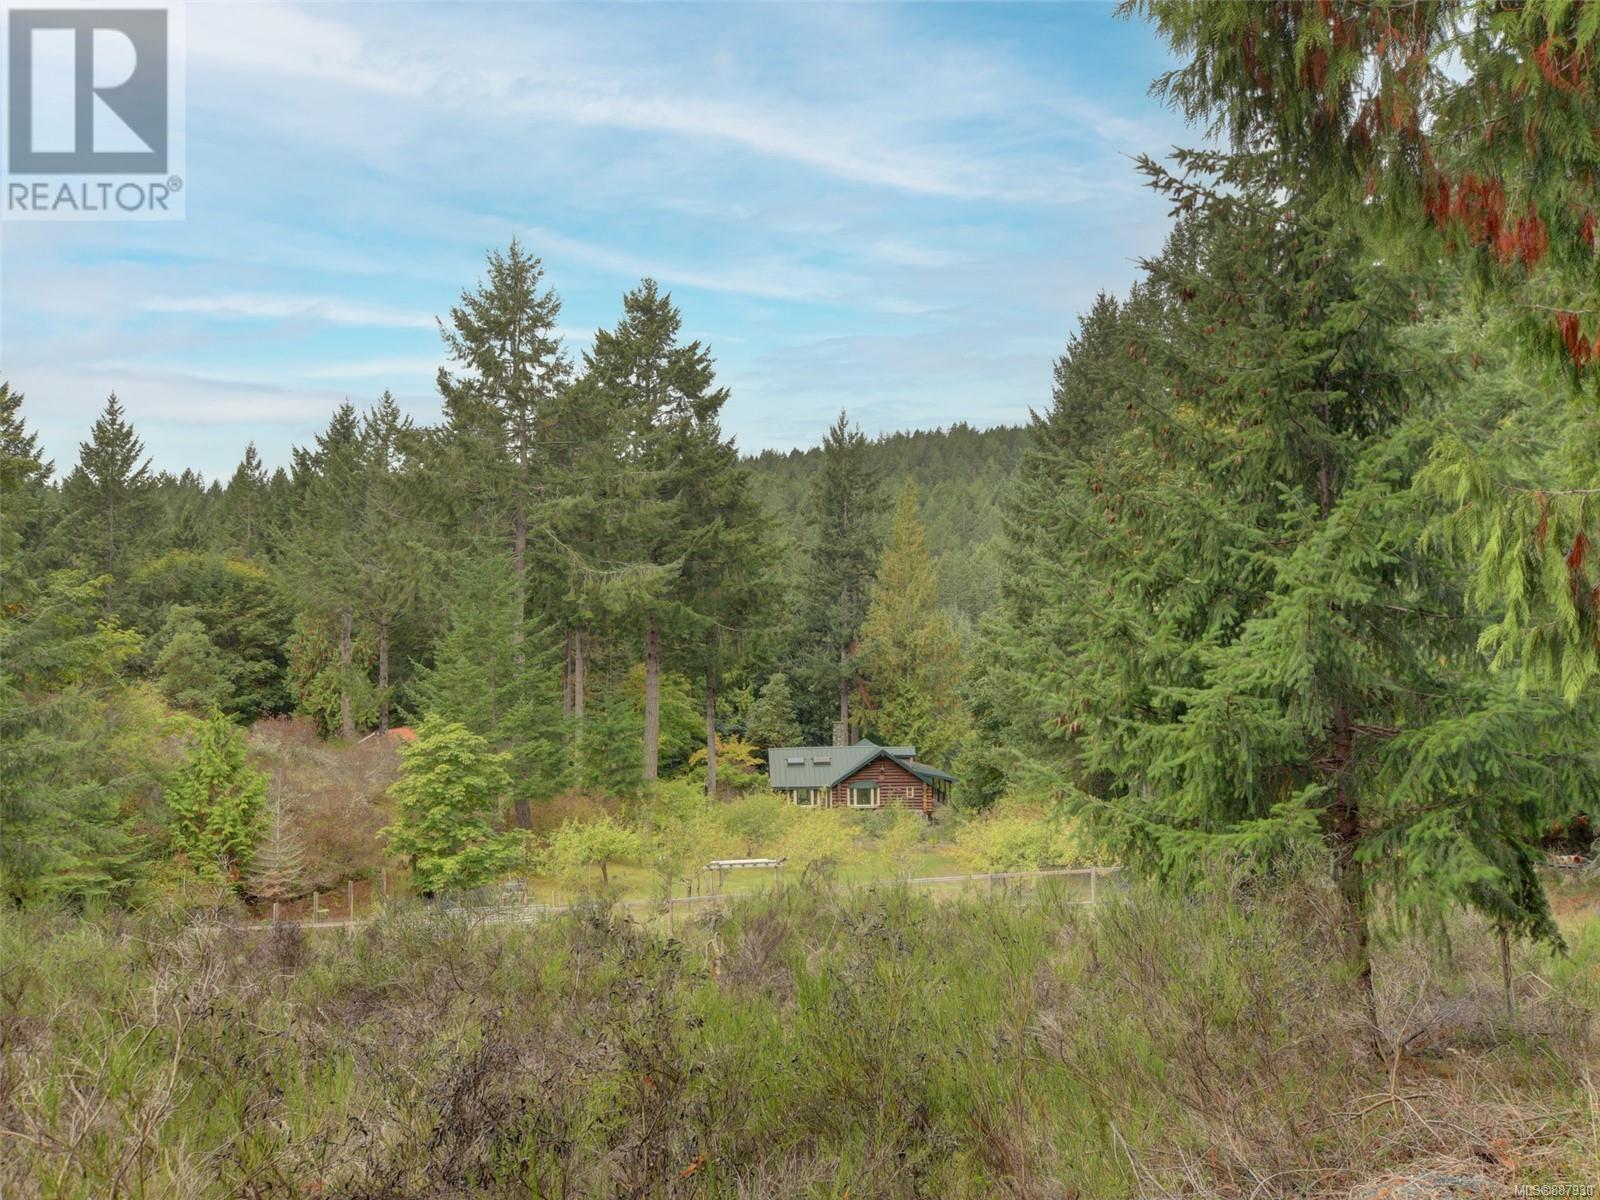 119 Ross-Durrance RdHighlands, British Columbia  V9V 2A3 - Photo 42 - 887930